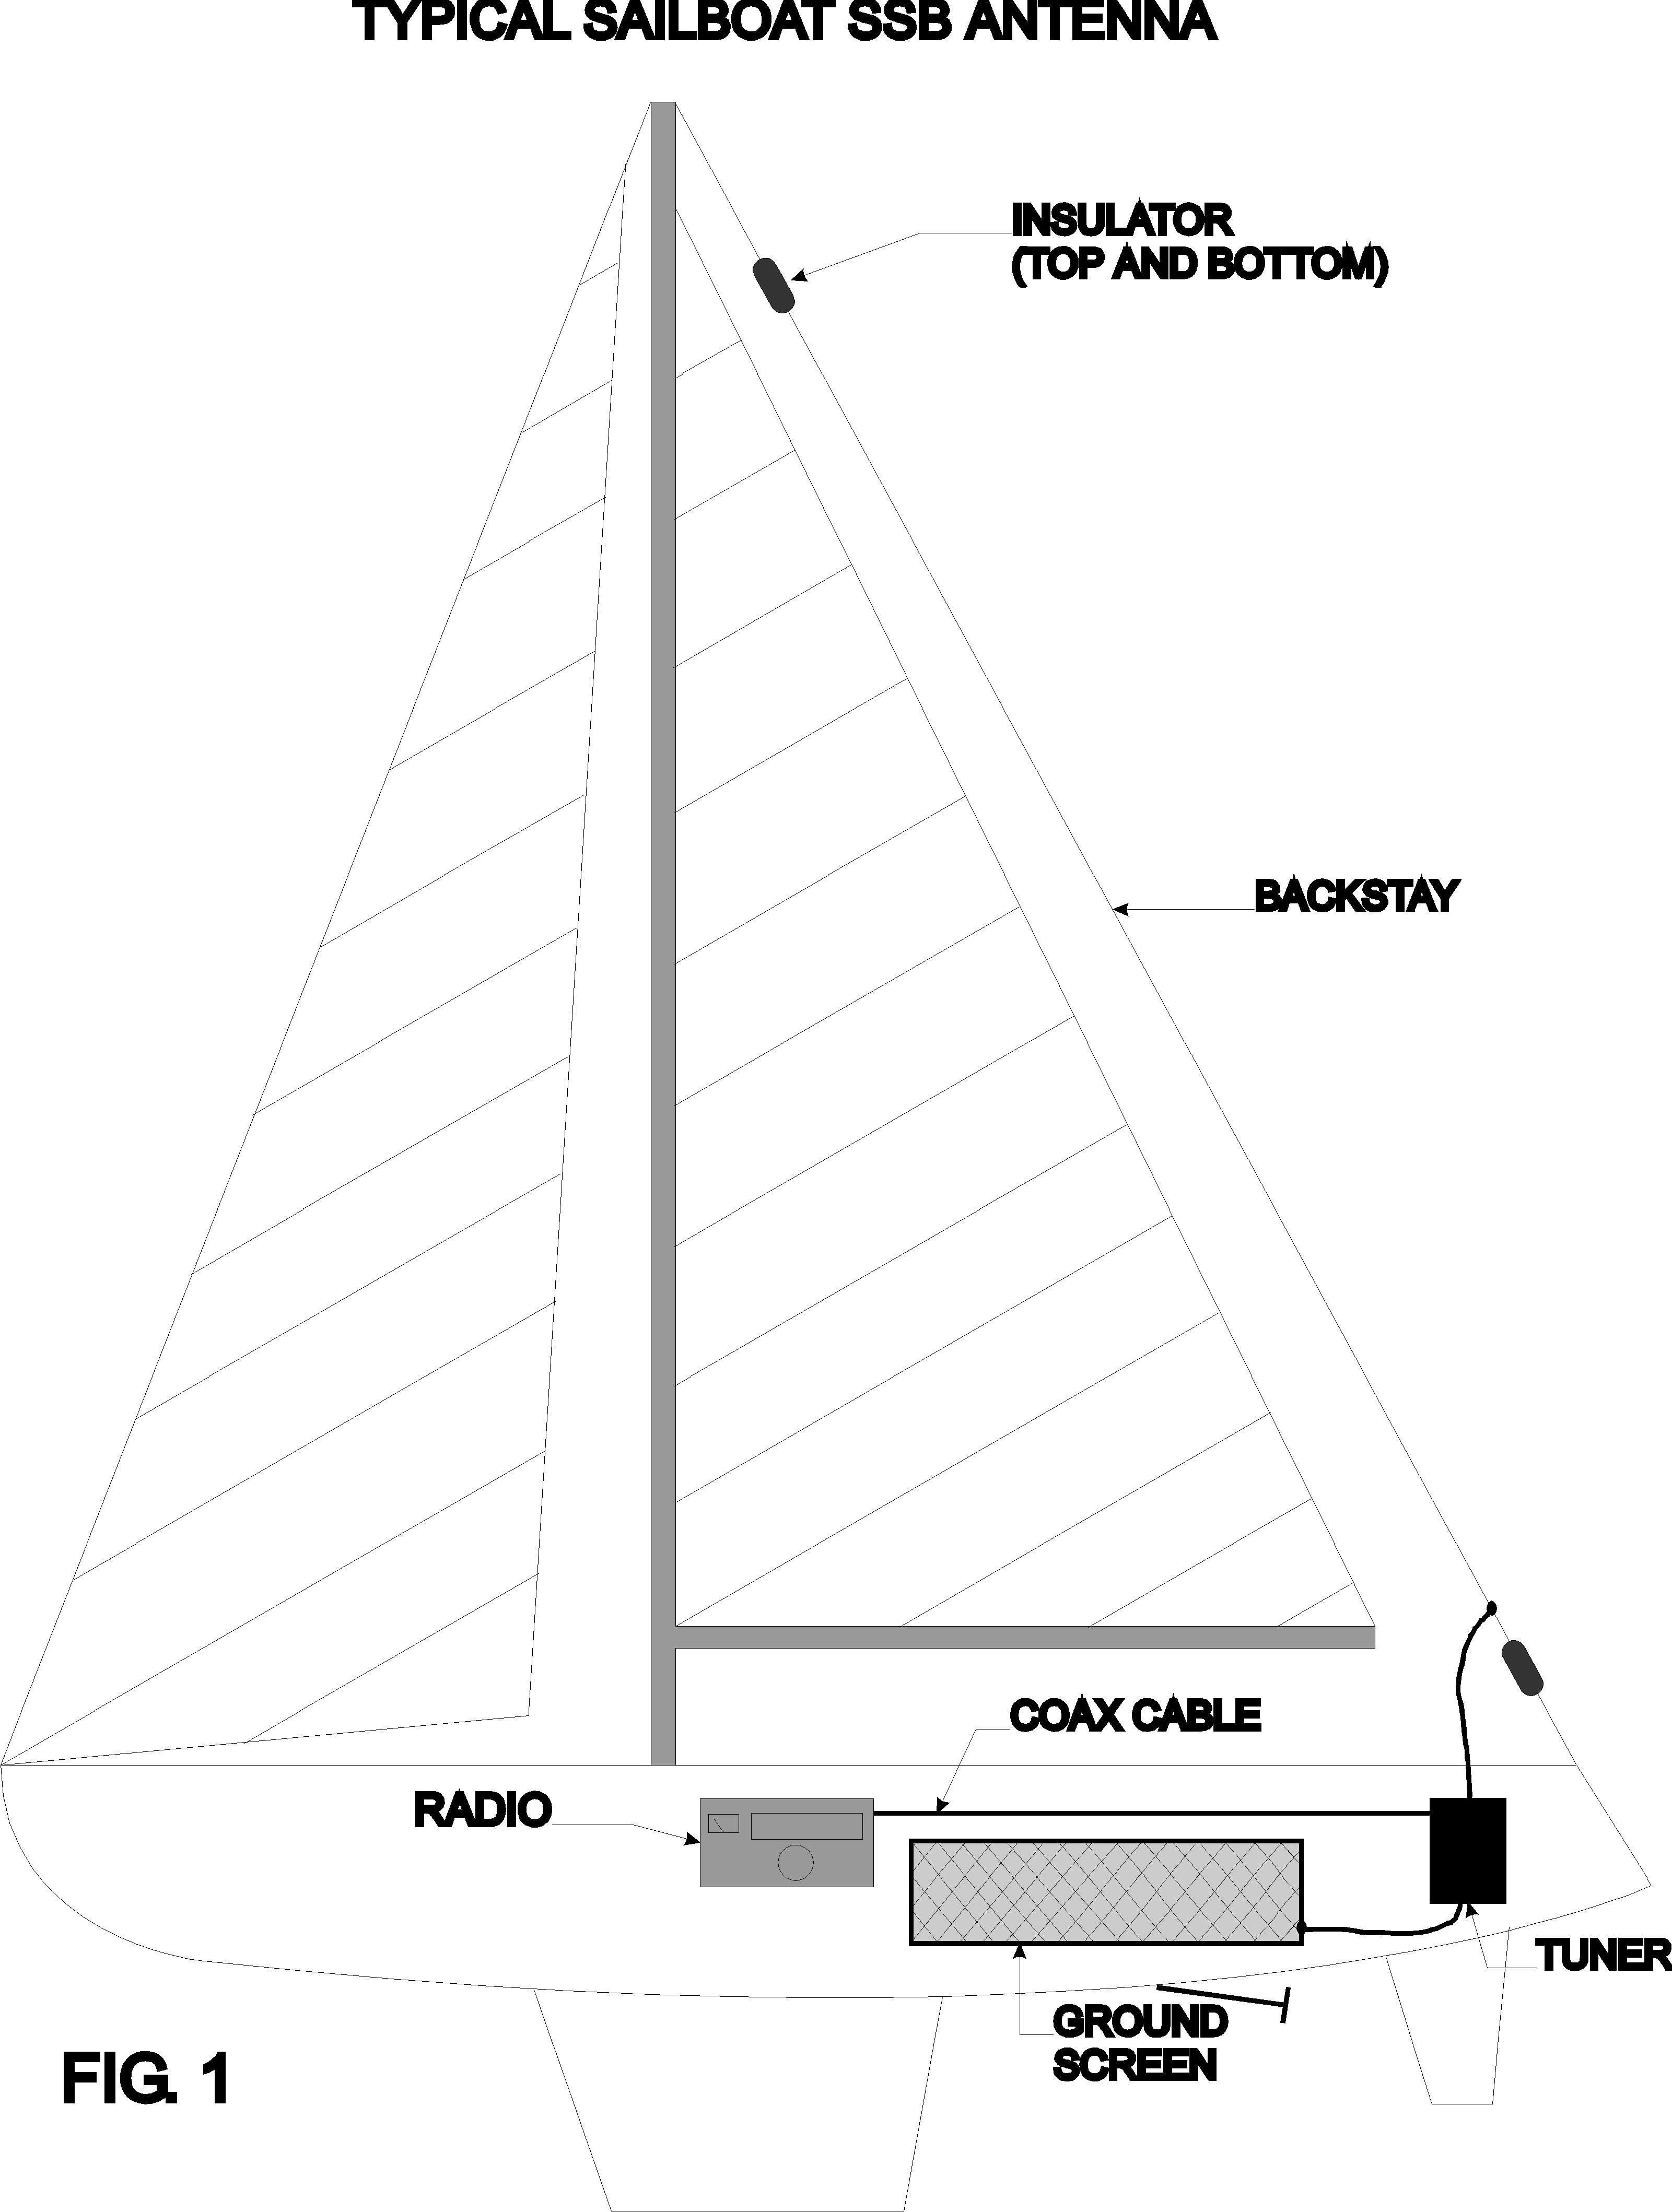 SSB Antenna